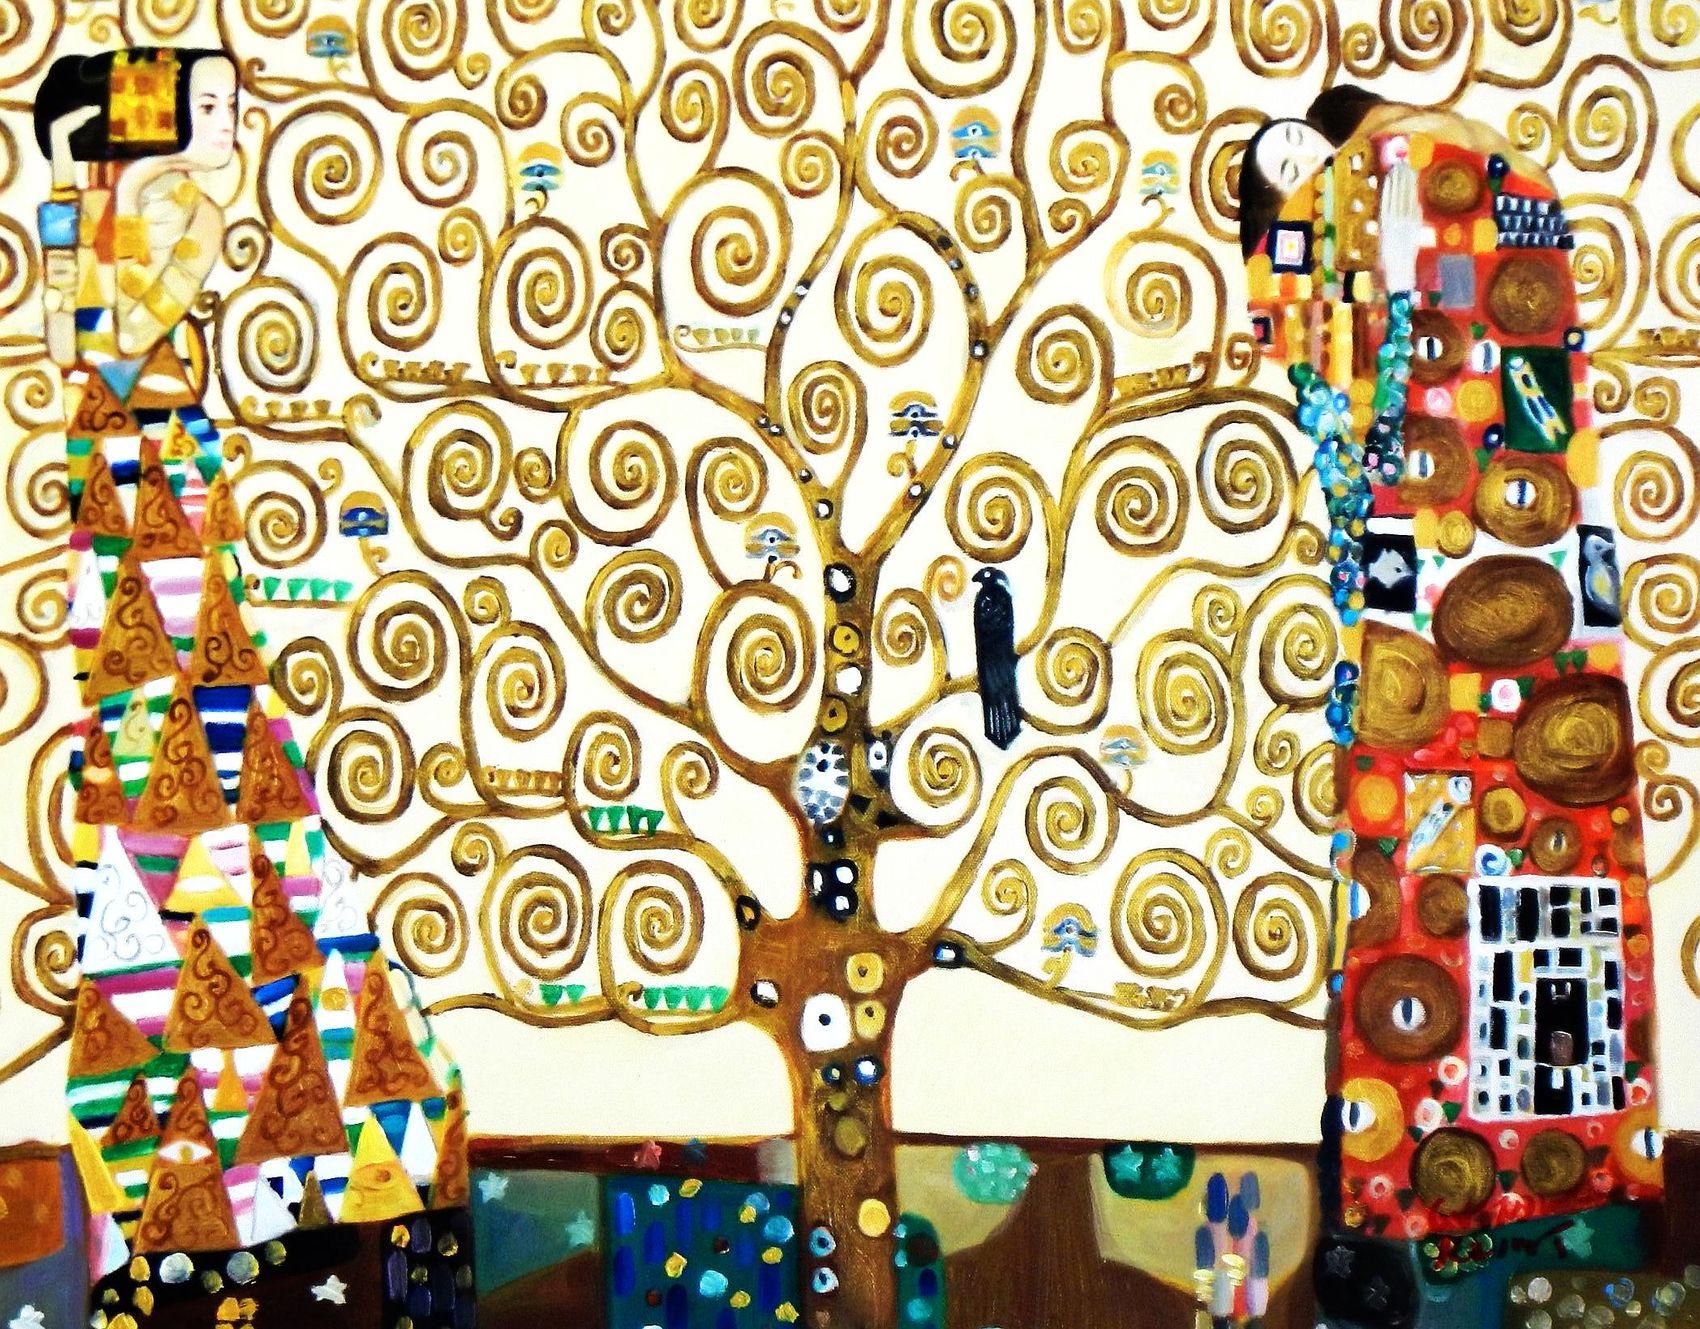 Gustav Klimt The Tree Of Life 50x60 Cm Reproduction Oil Painting